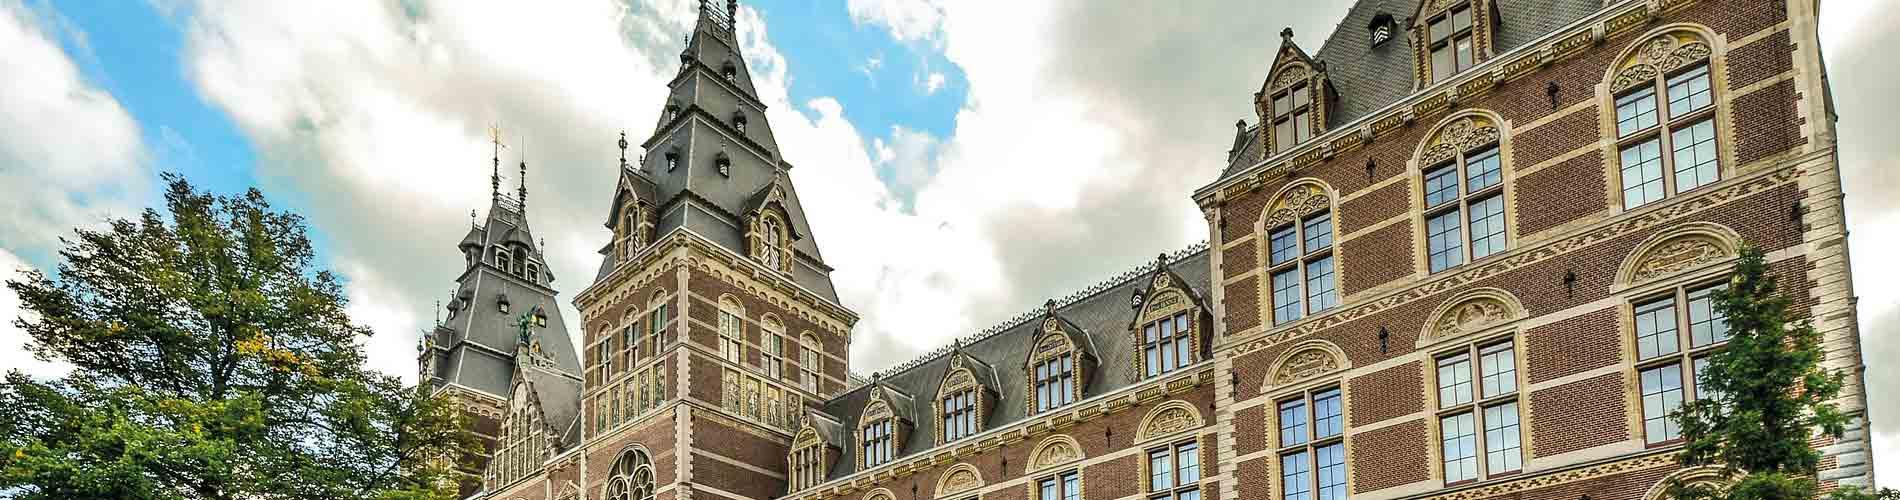 Blog_AmsterdamGuide_MuseumHopping_1900x500_Q120